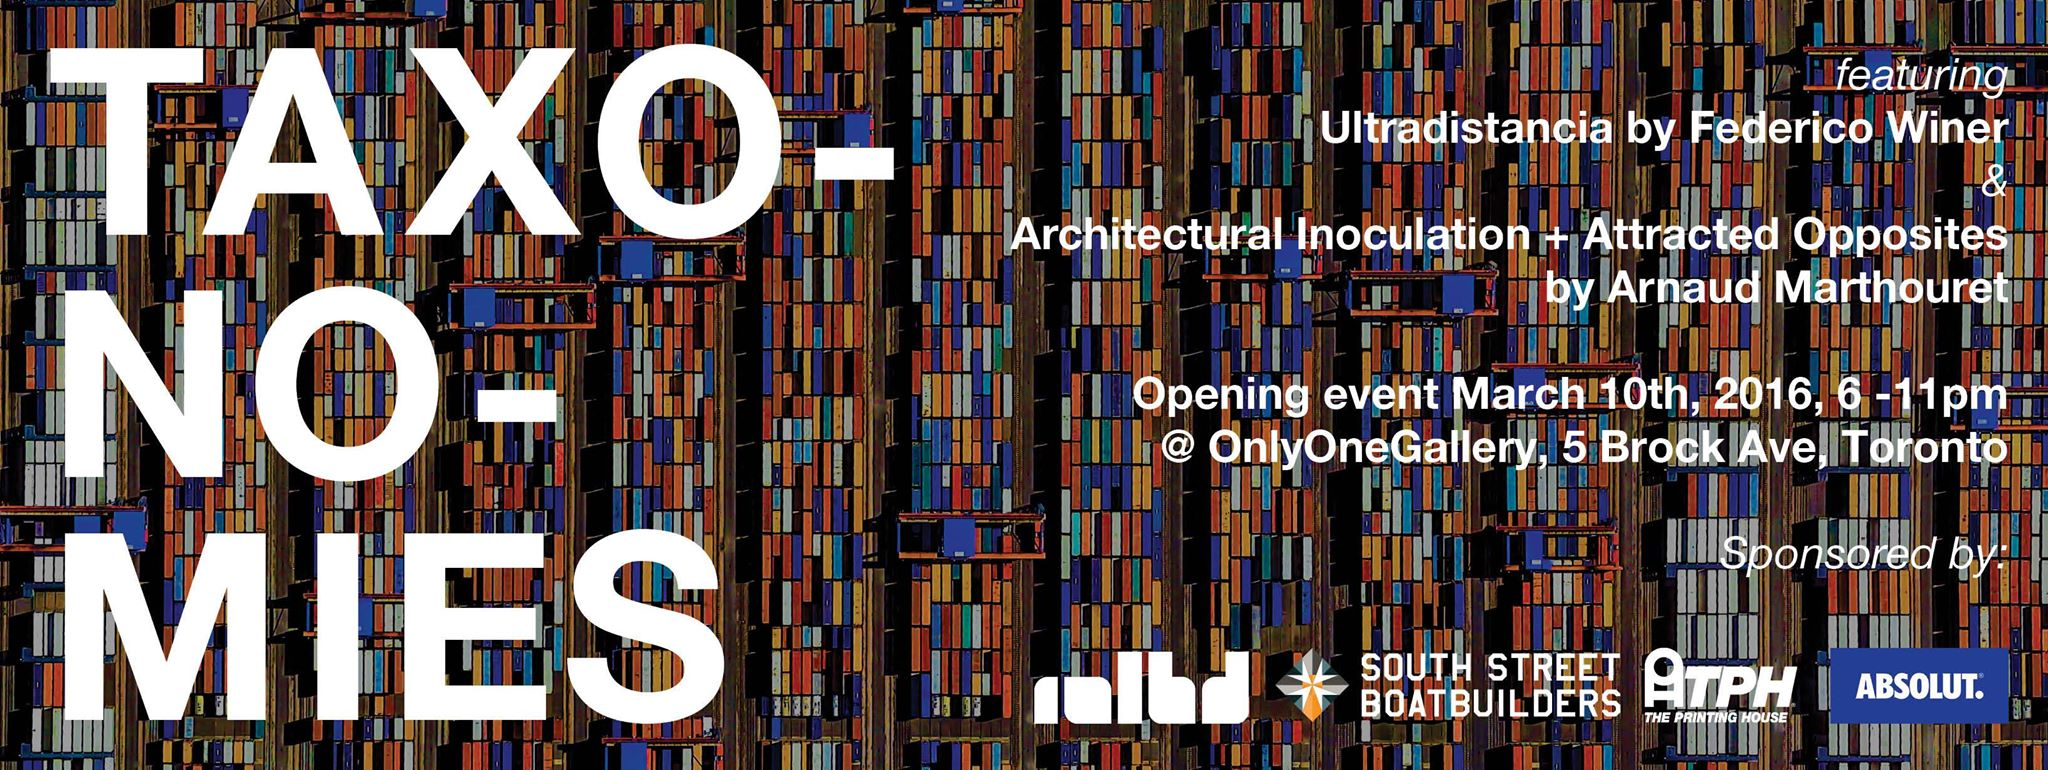 Ultradistancia-Taxonomies Exhibition at Onlyone Gallery Toronto. Web Flyer